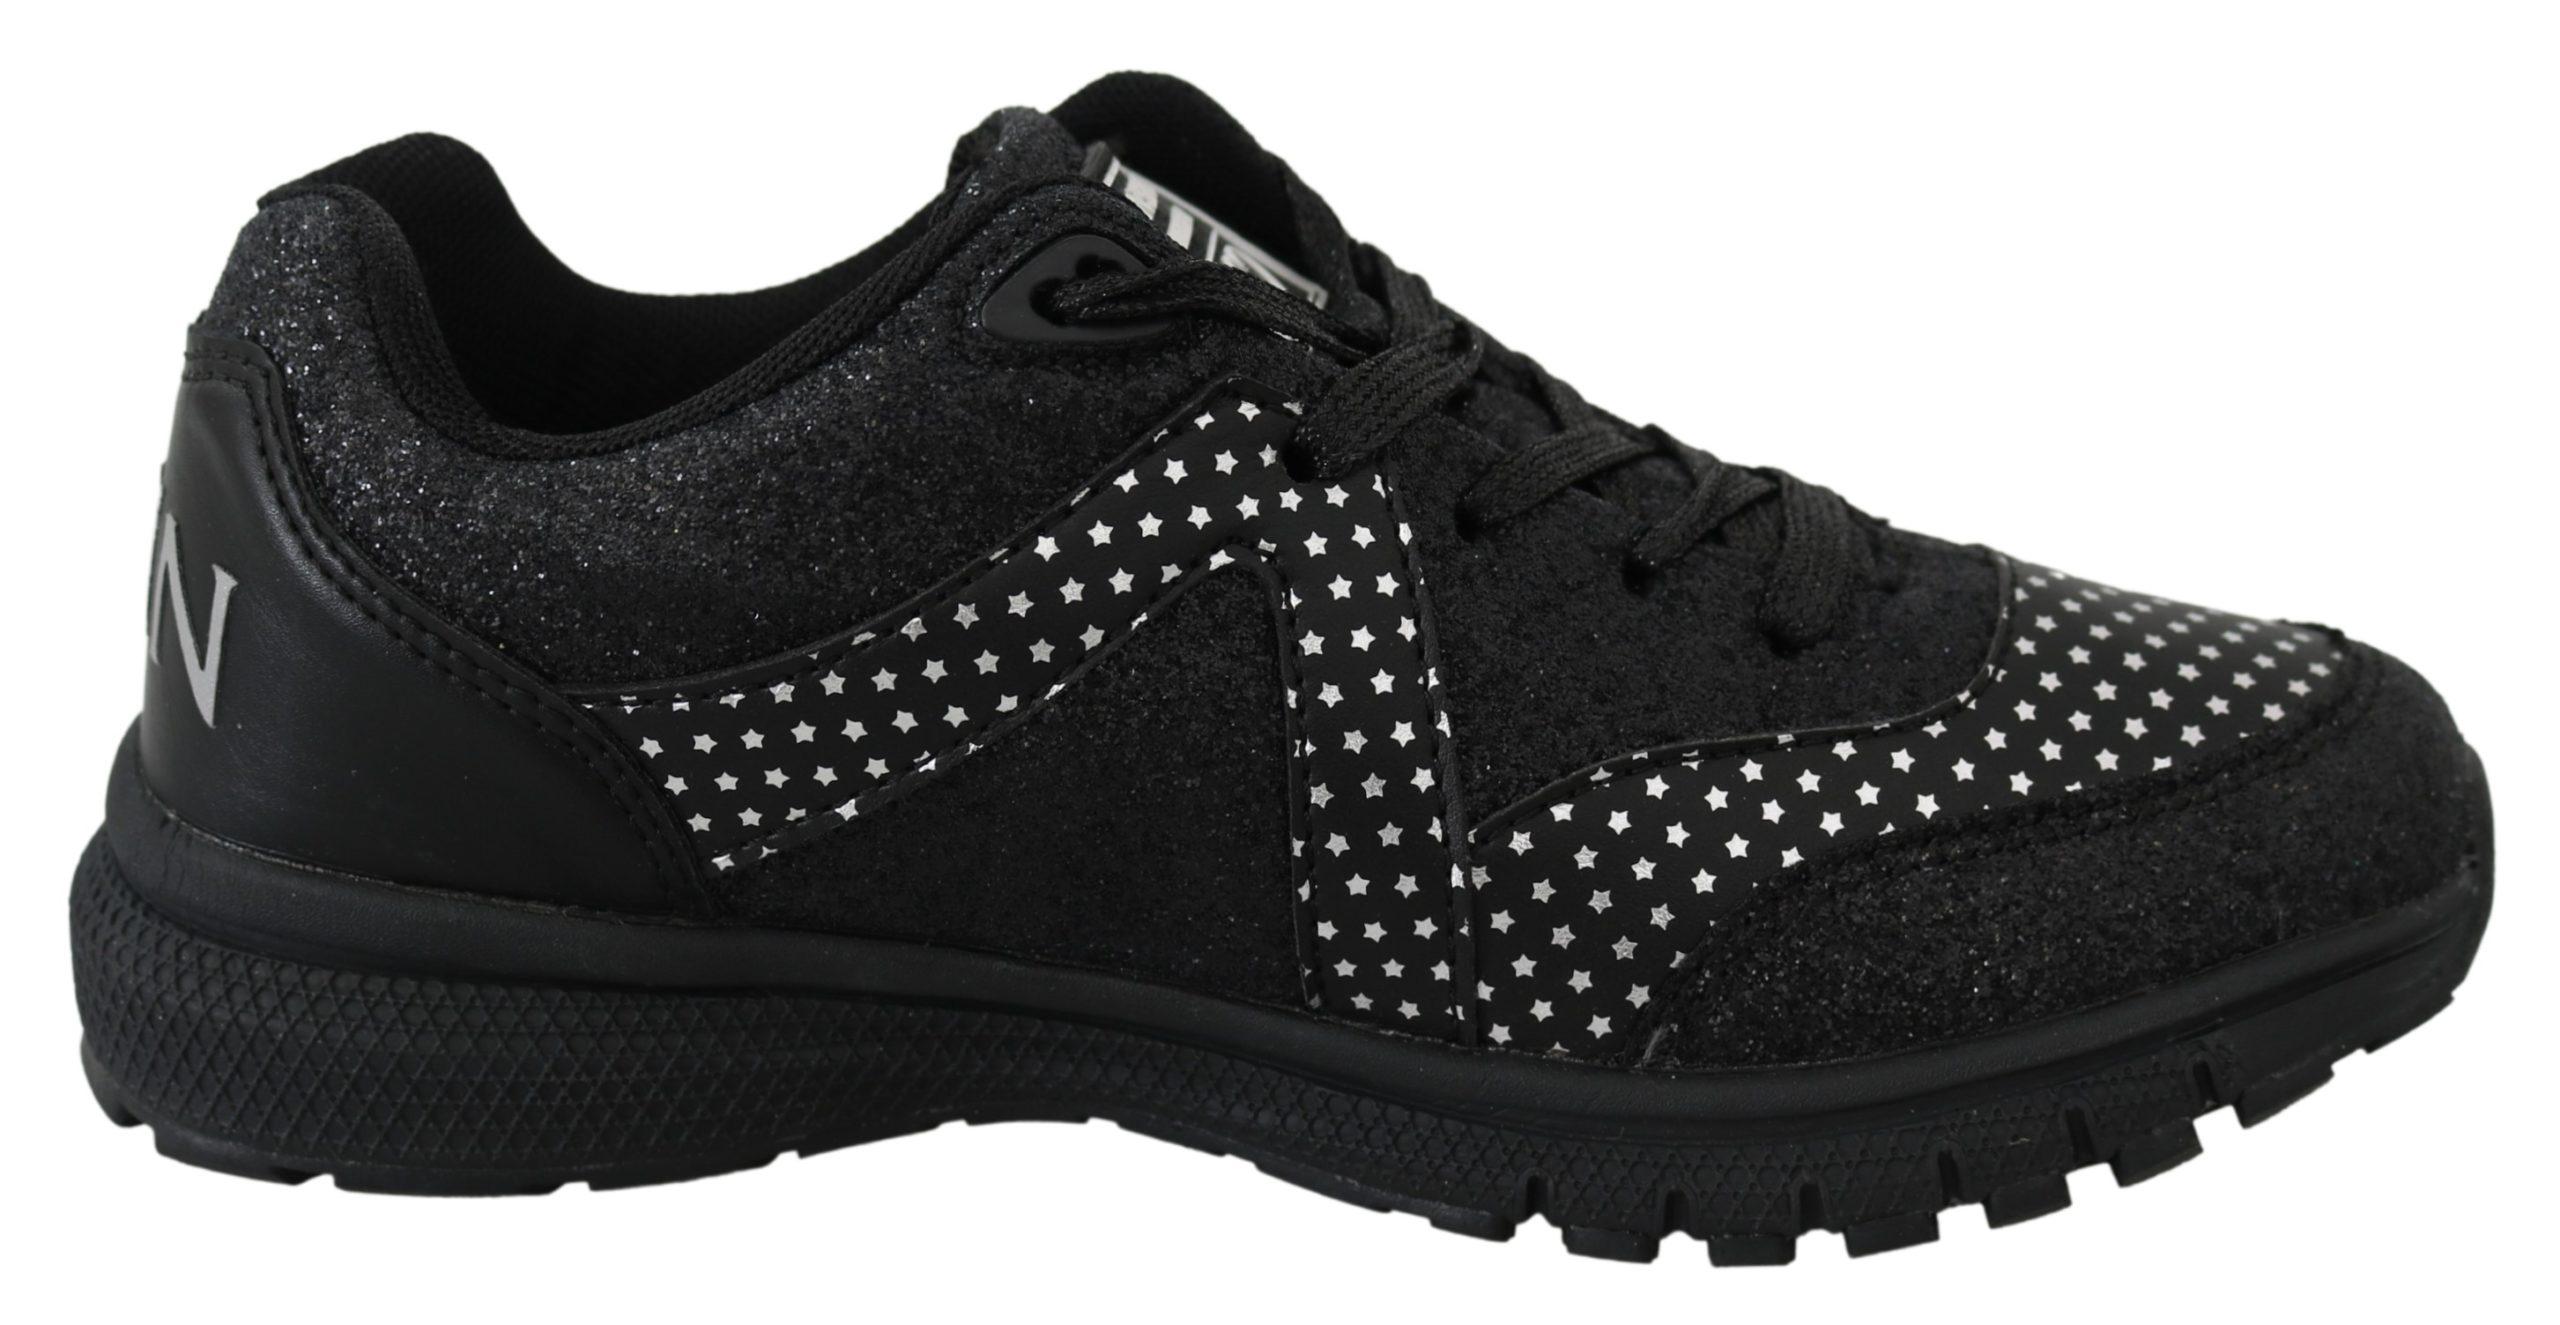 Black Polyester Runner Jasmines Sneakers Shoes - EU38/US8